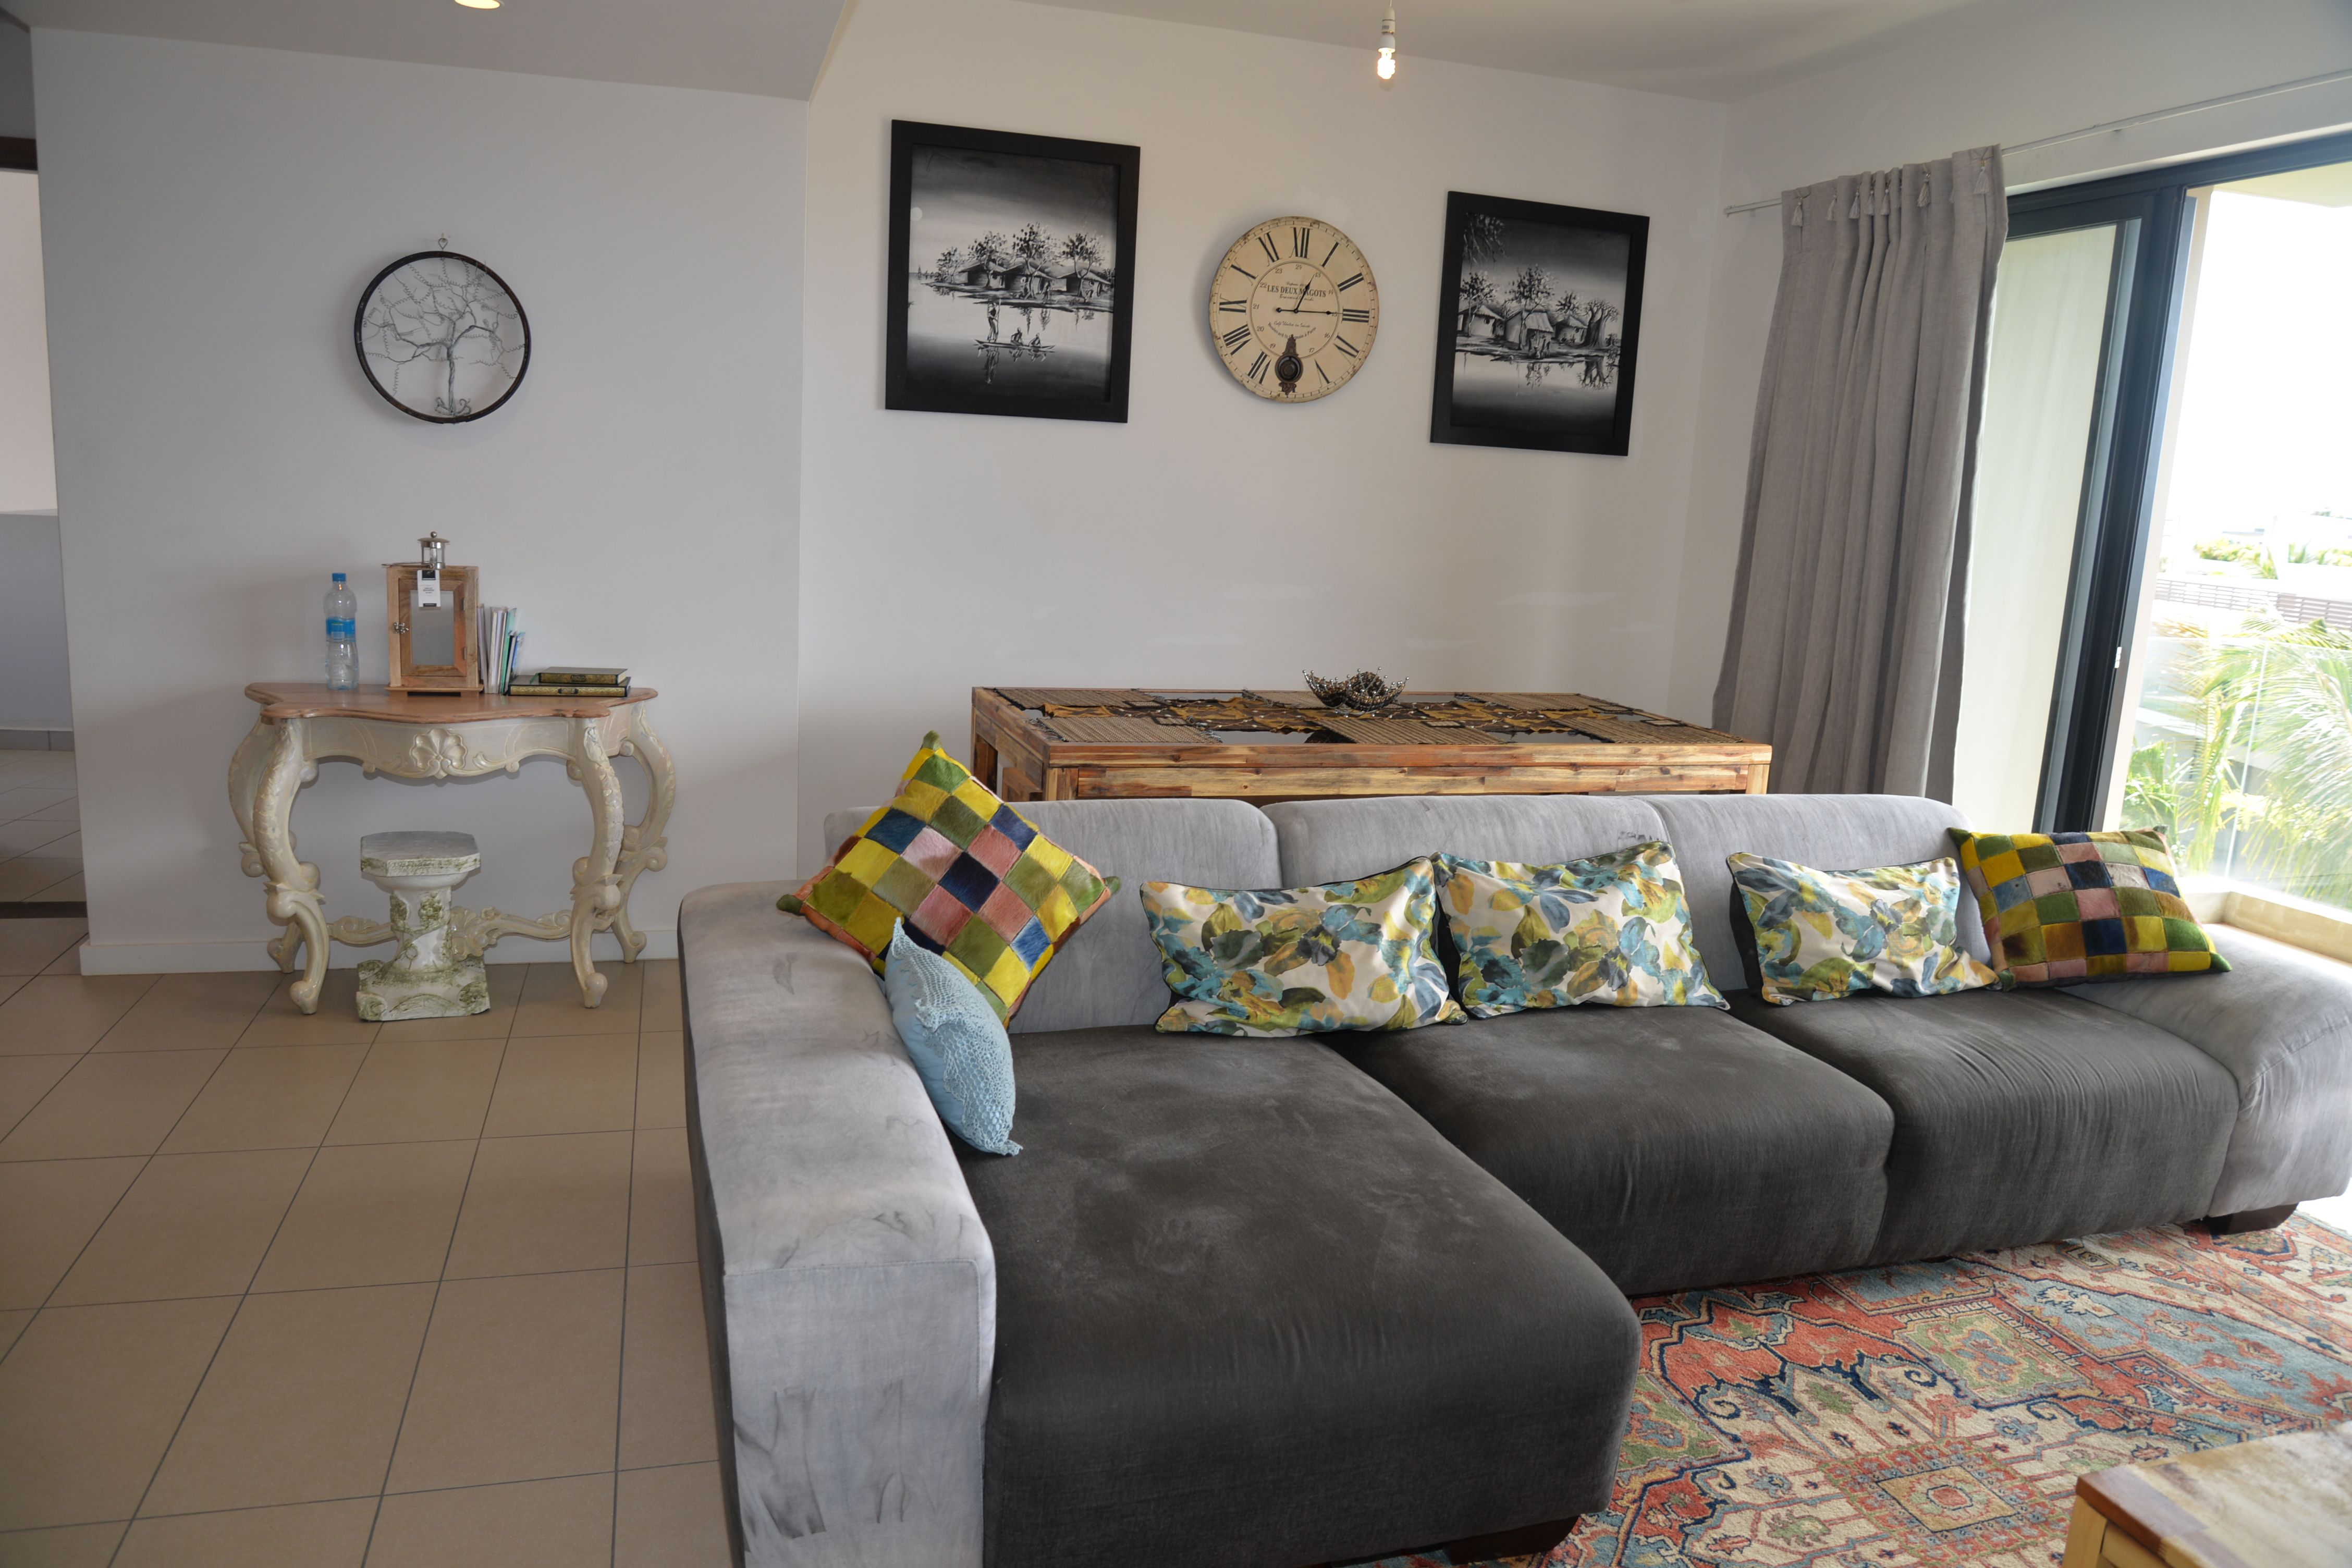 Residence Hoteliere Chez Aziz Avenue Sidi Srifi Zkt Batalla Alhamra Morocco Ma Africa